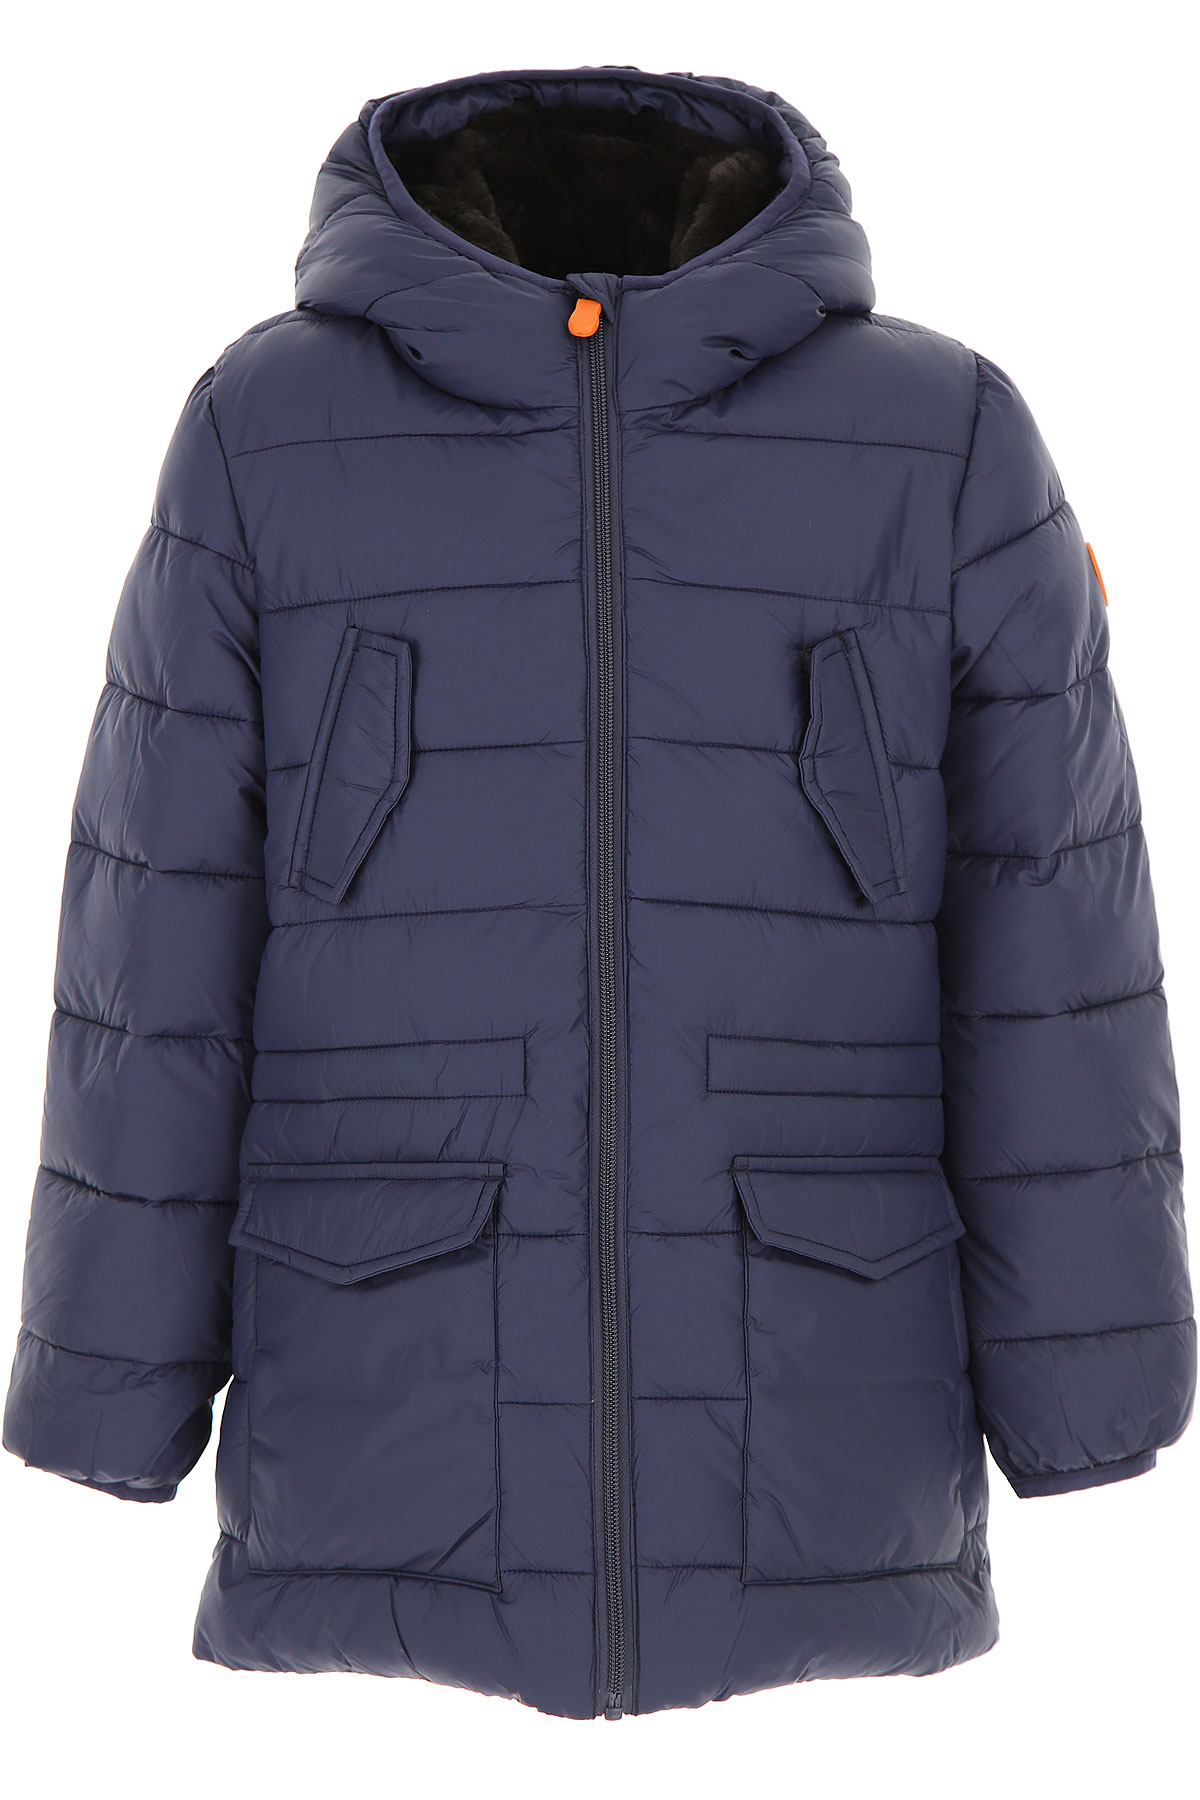 Image of Save the Duck Boys Down Jacket for Kids, Puffer Ski Jacket, navy, Nylon, 2017, 10Y 16Y 2Y 4Y 6Y 8Y